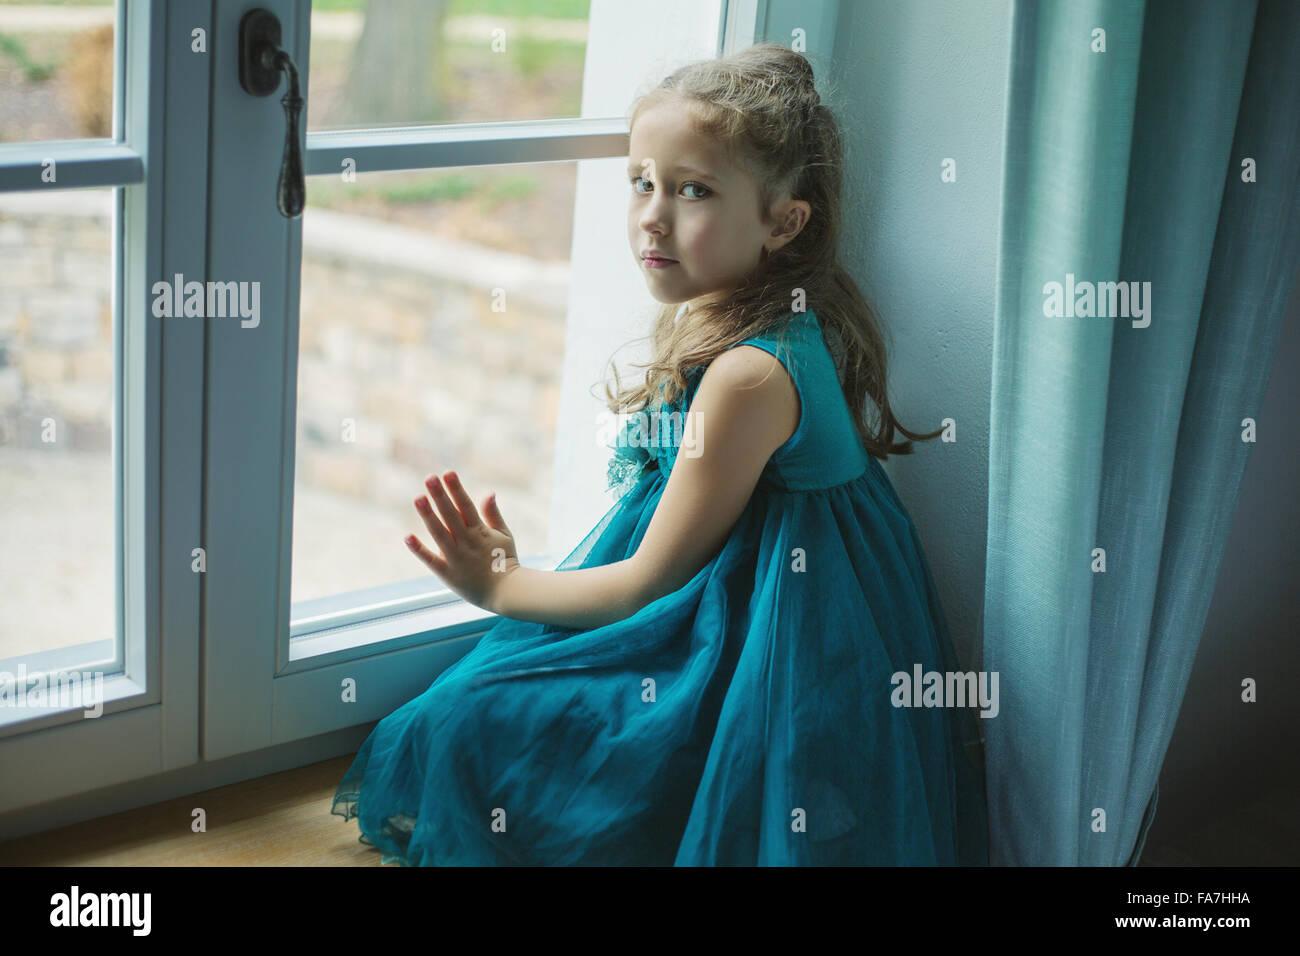 Sad girl looking through window - Stock Image